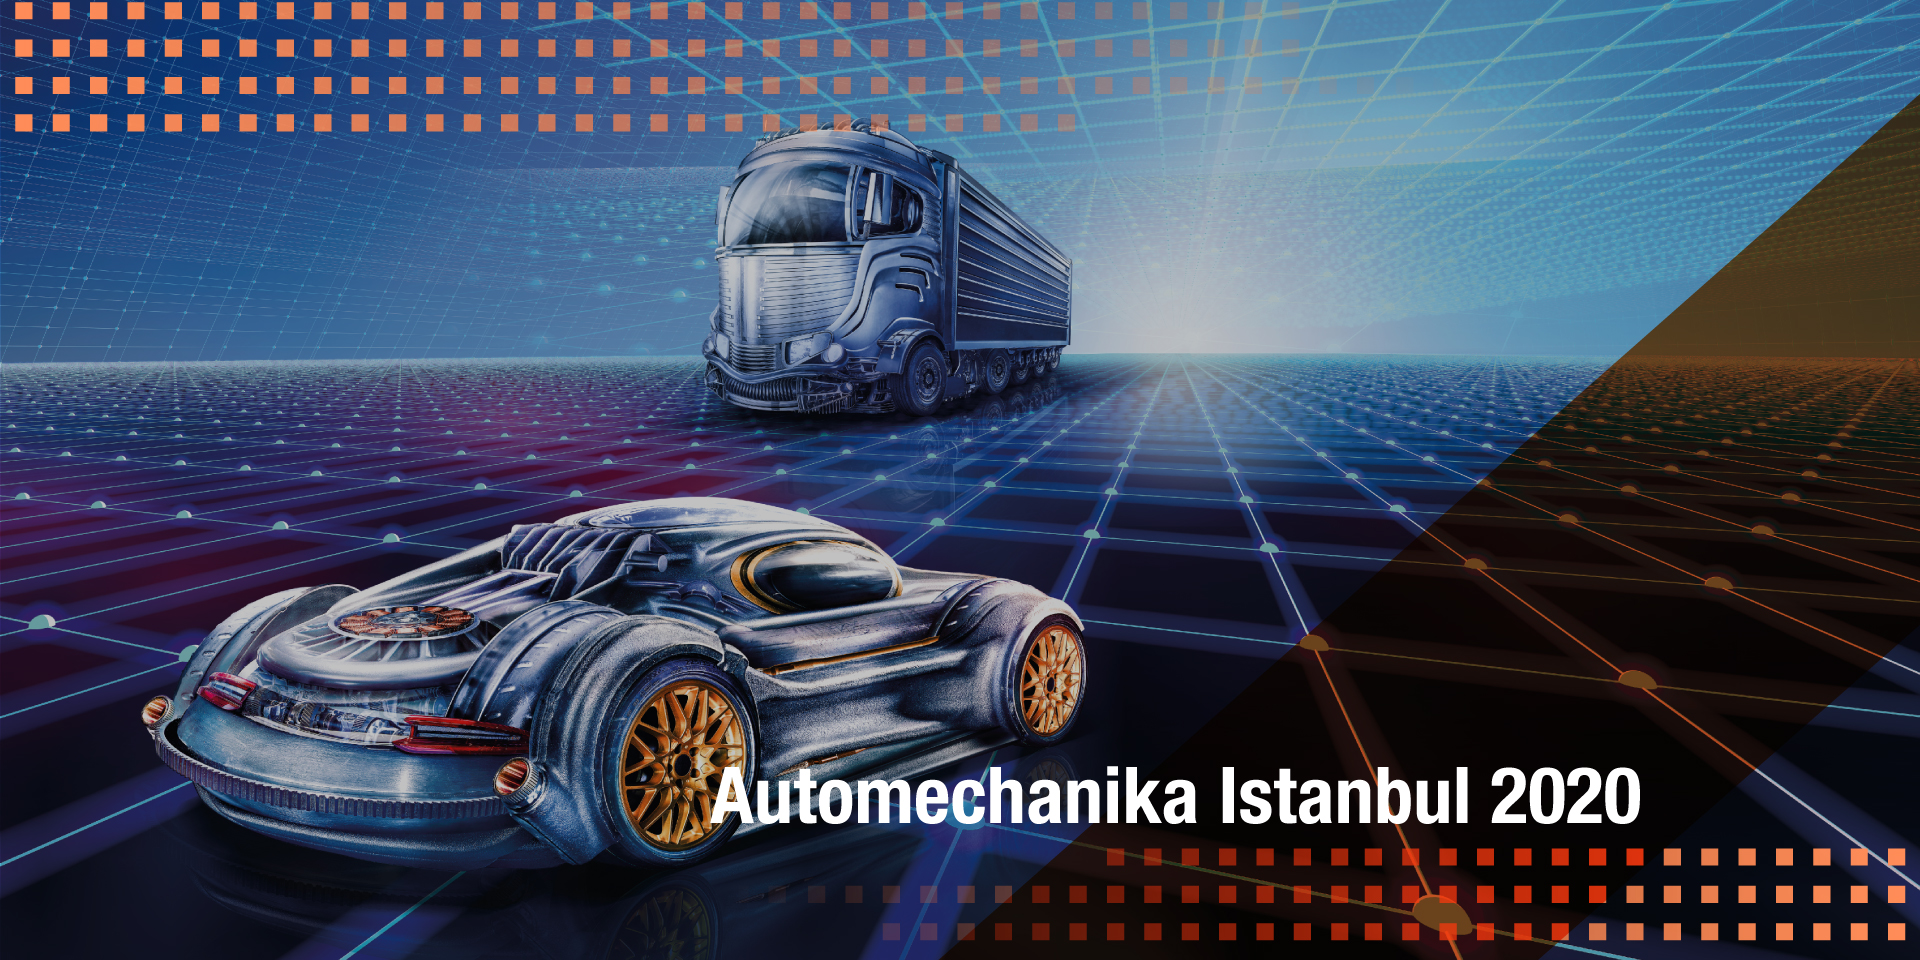 Automechanika Instanbul 2020